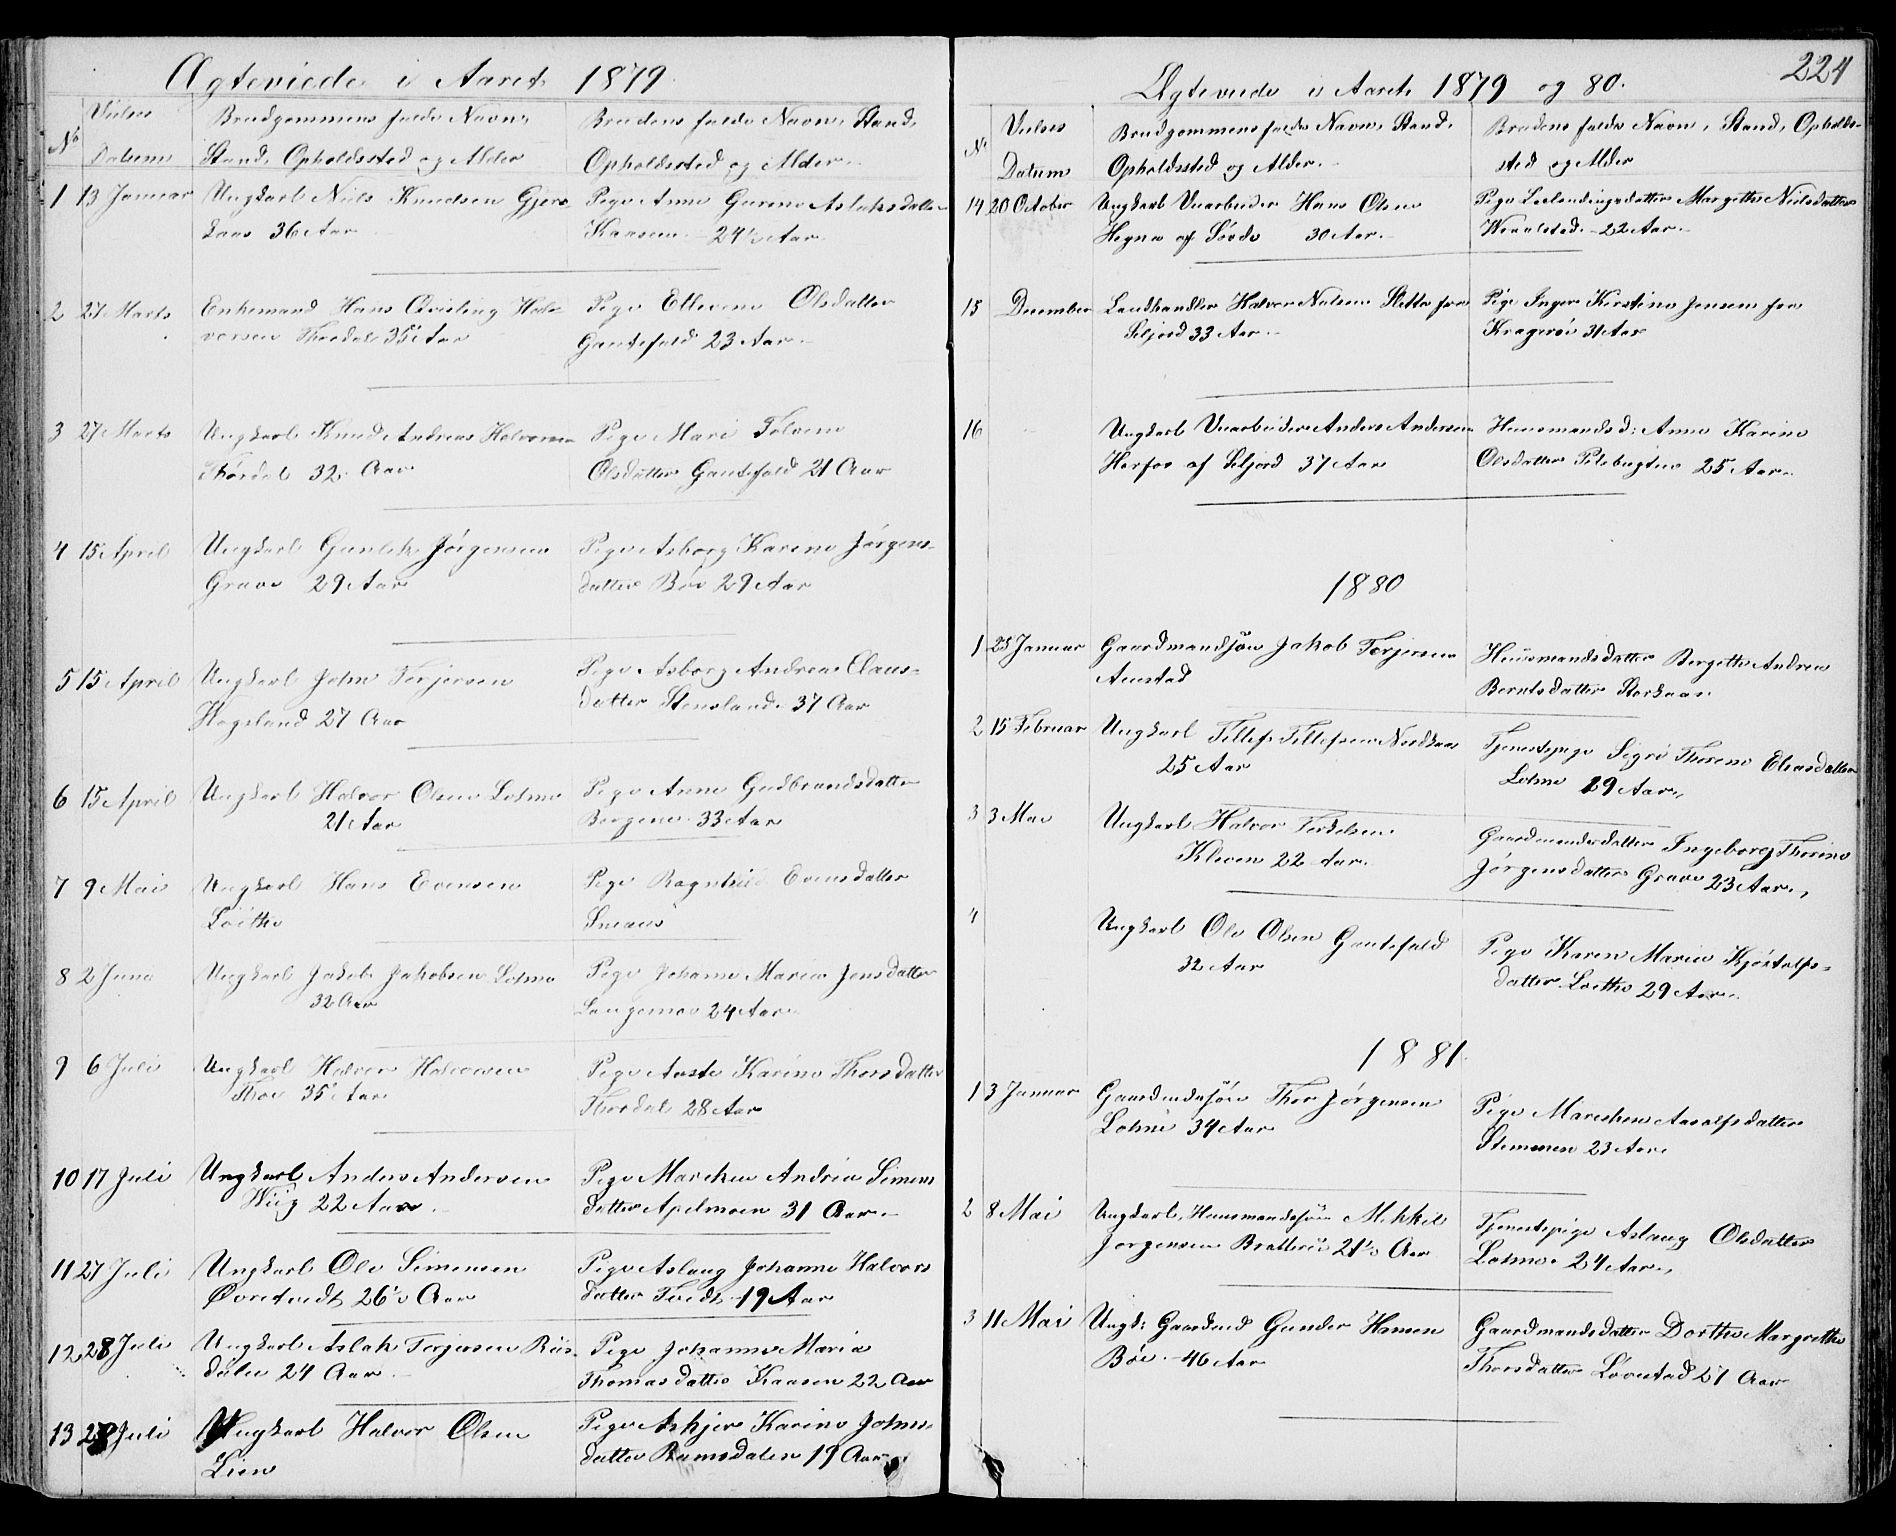 SAKO, Drangedal kirkebøker, G/Gb/L0001: Klokkerbok nr. II 1, 1856-1894, s. 224